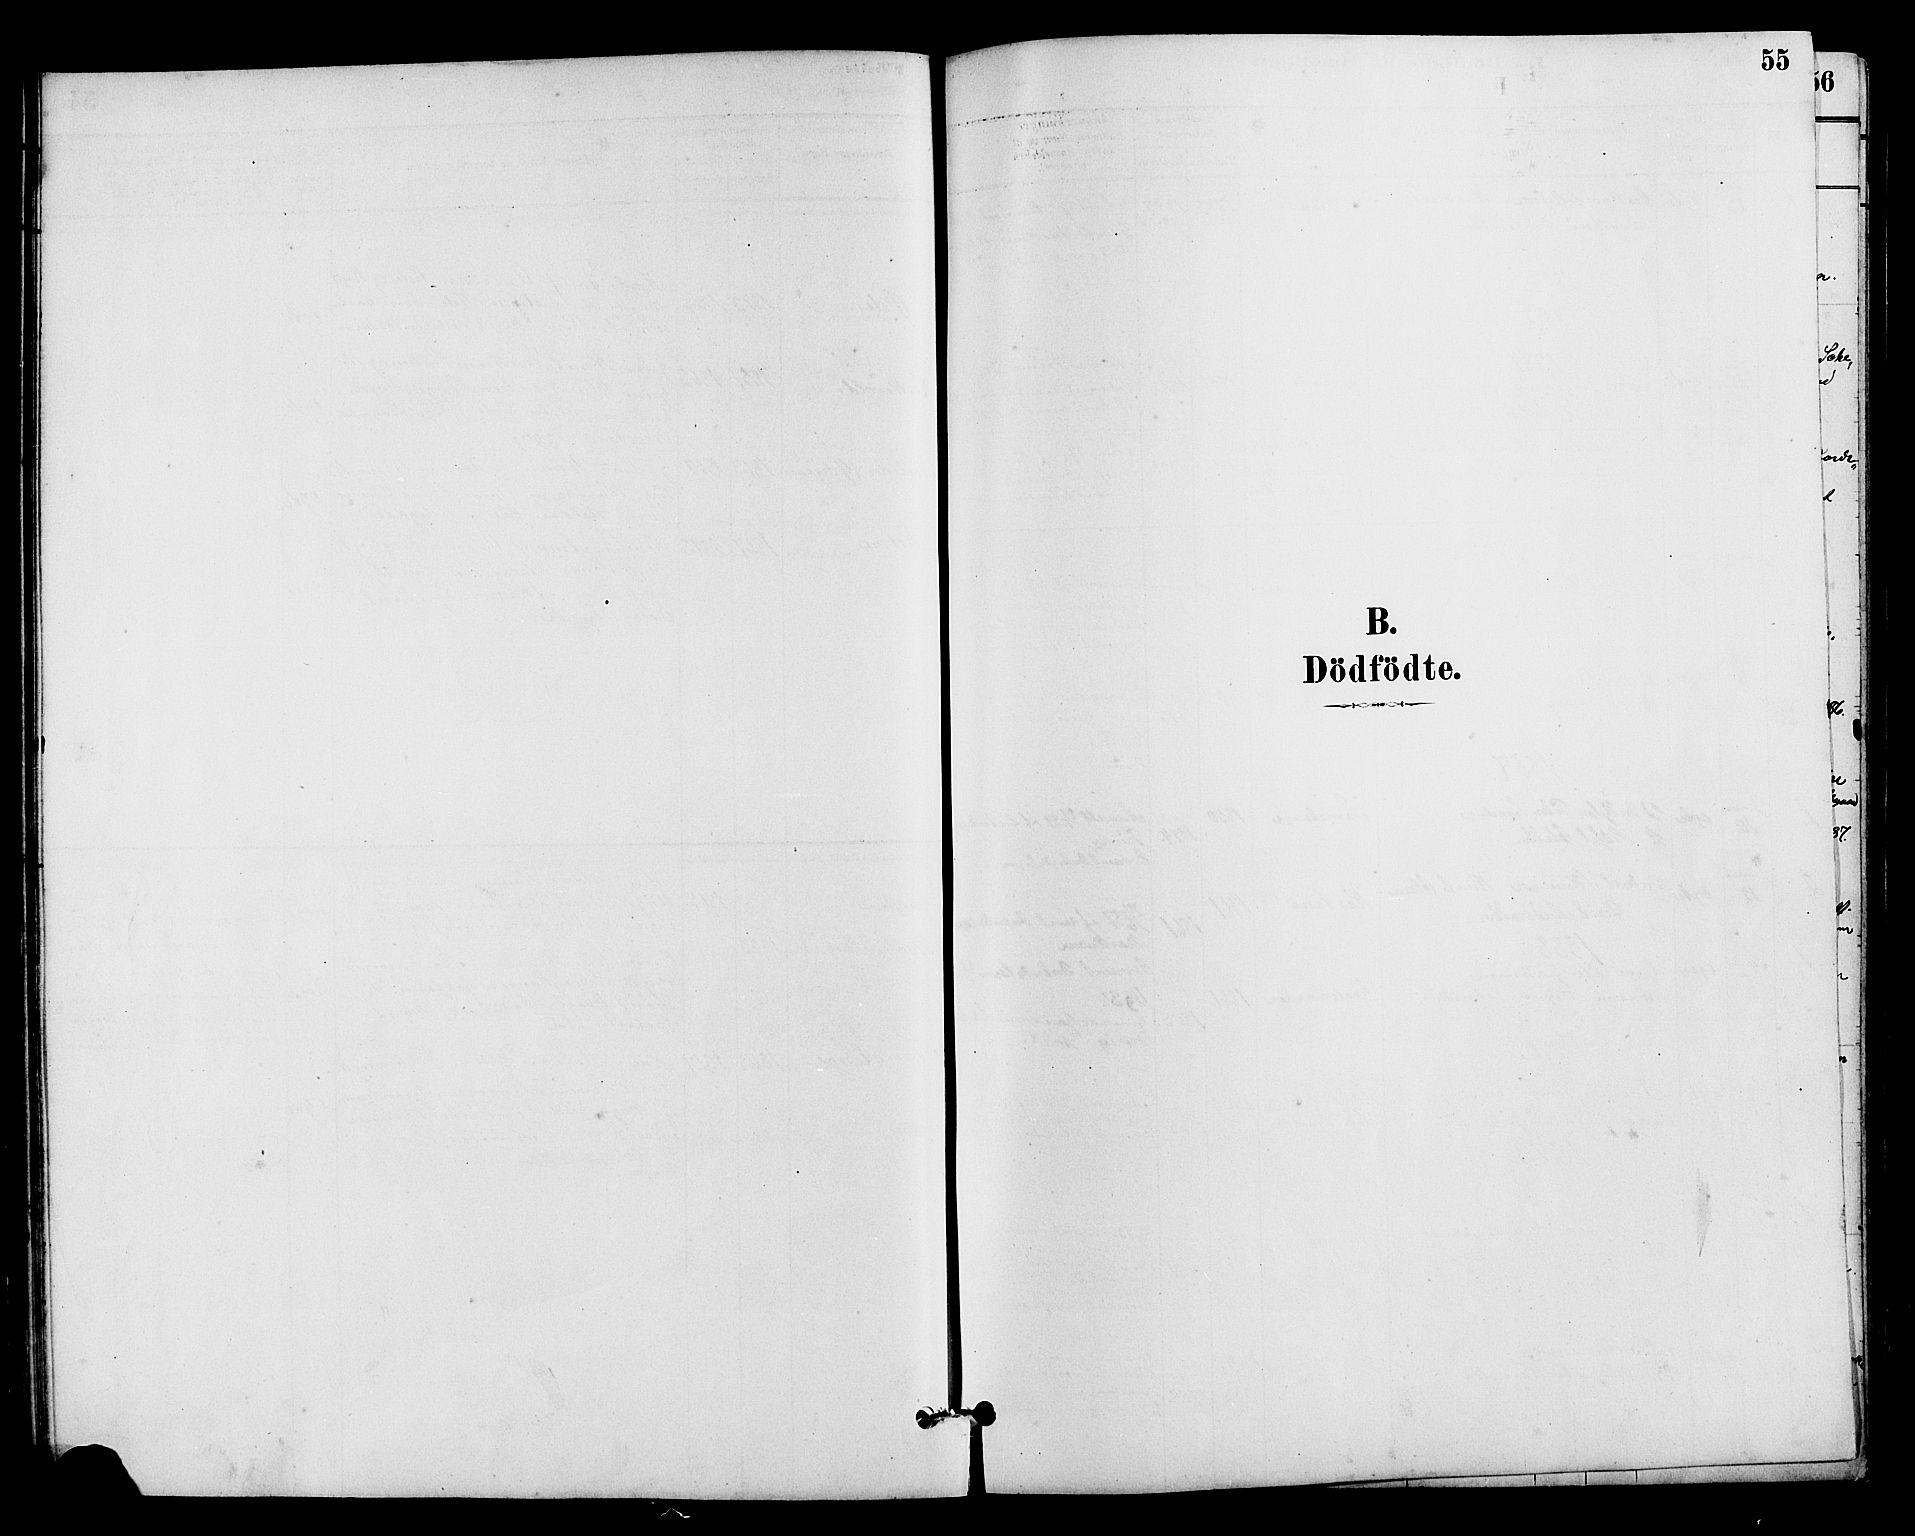 SAH, Vestre Slidre prestekontor, Klokkerbok nr. 5, 1881-1913, s. 55